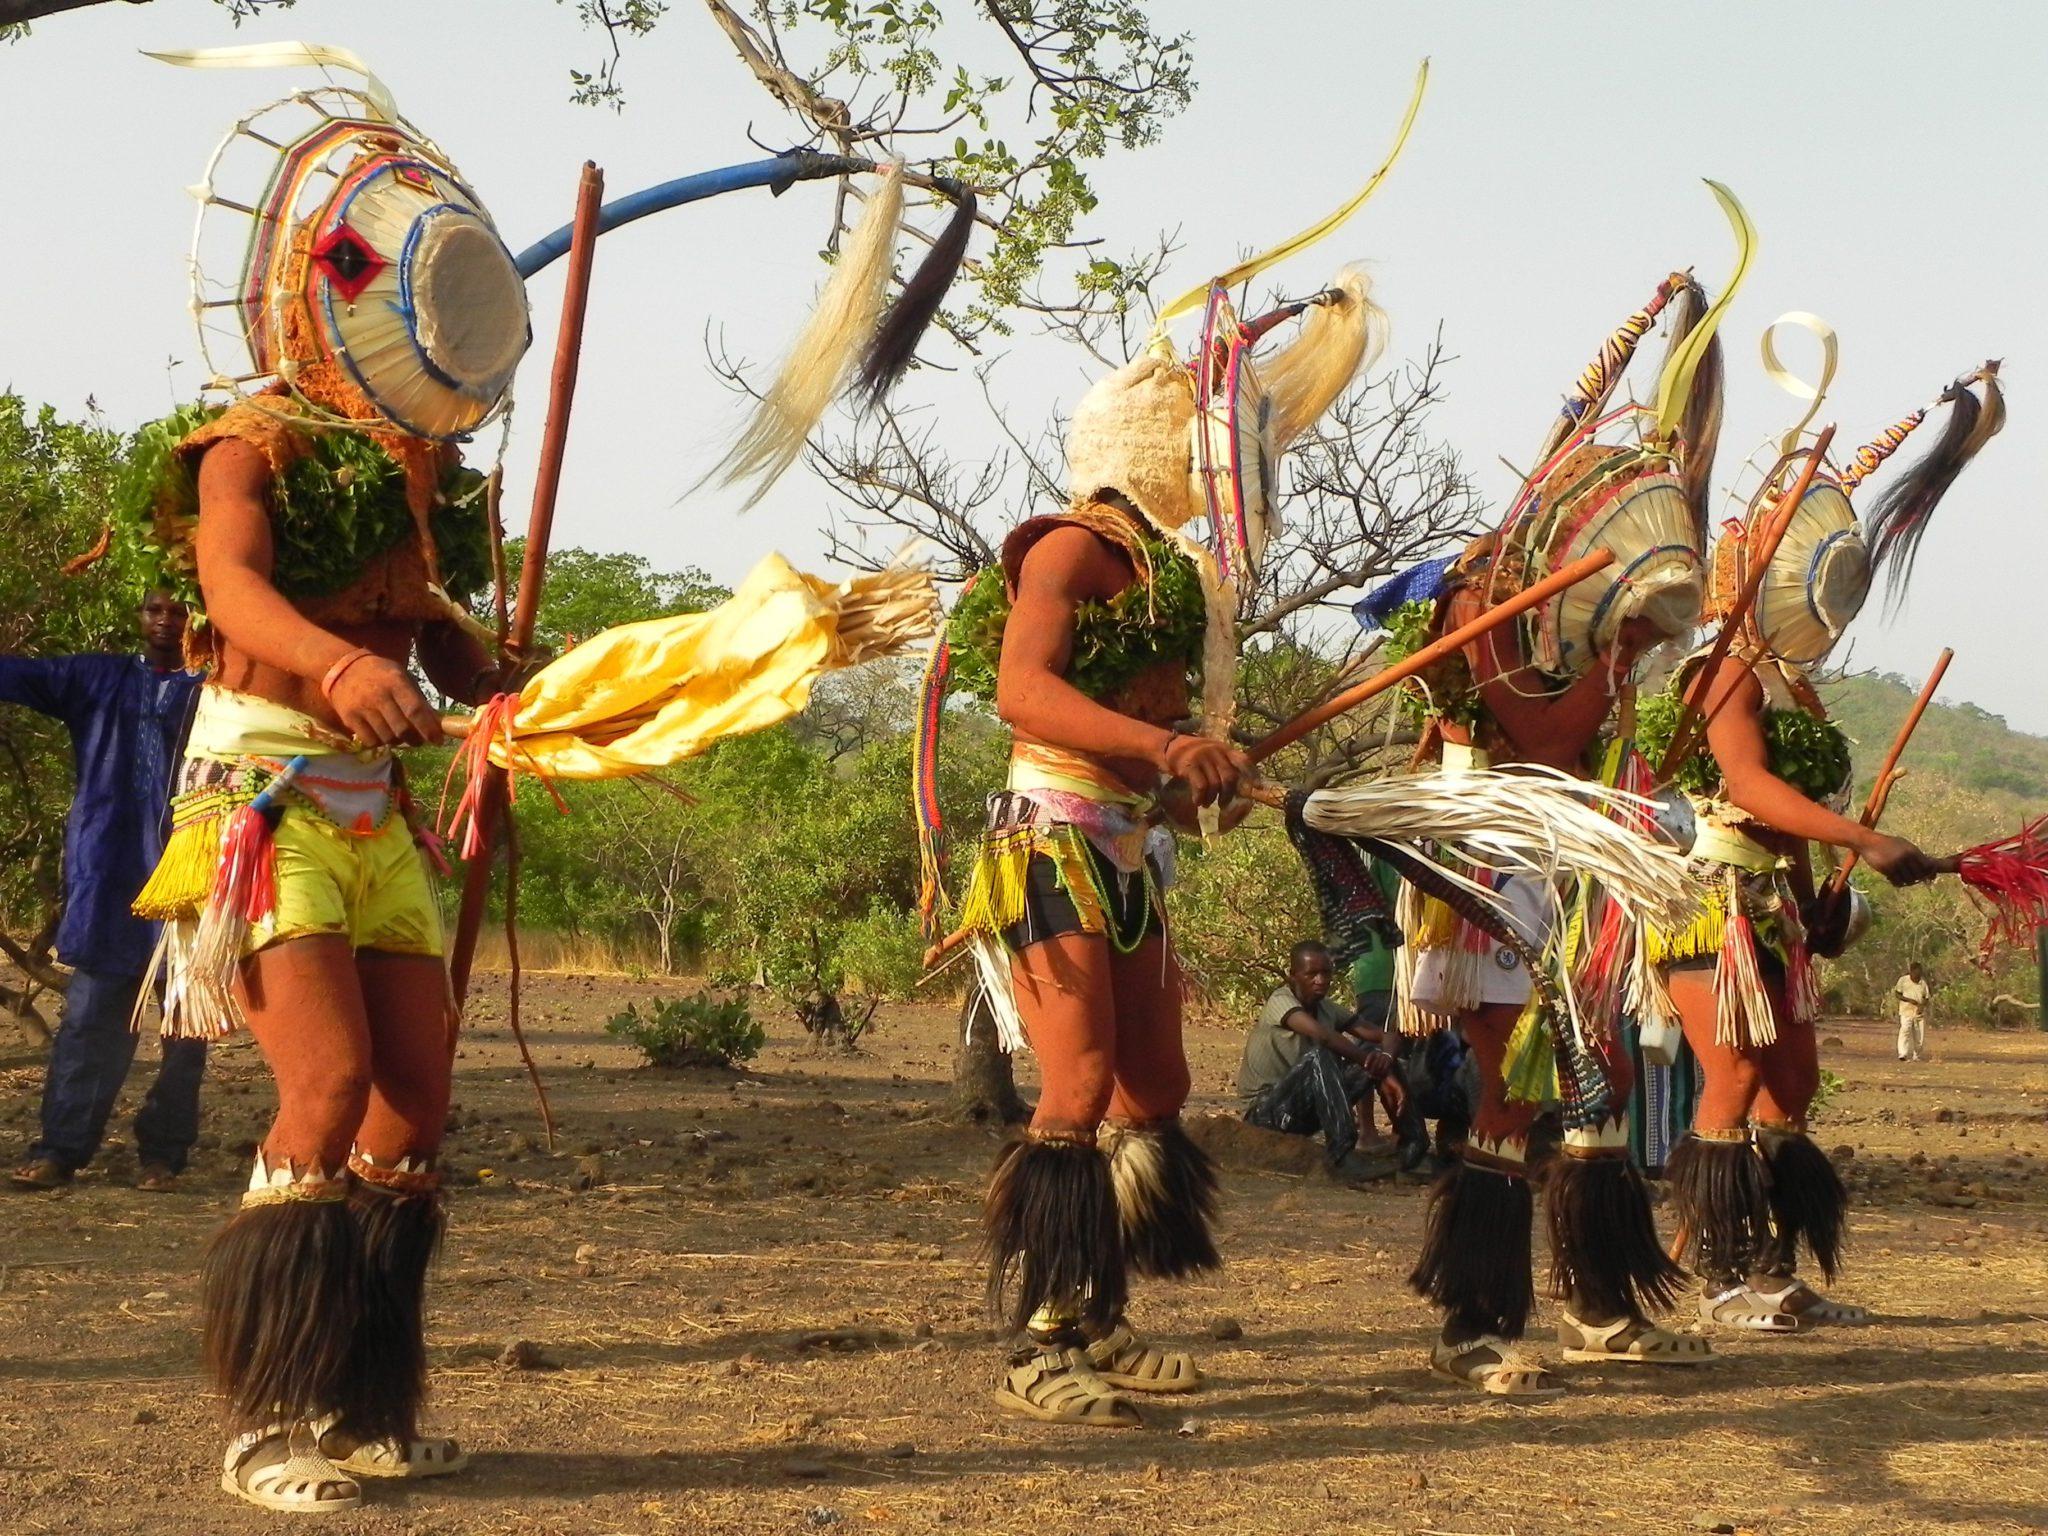 Senegal & Ghana holiday: 11 day Western Africa overlanding tour